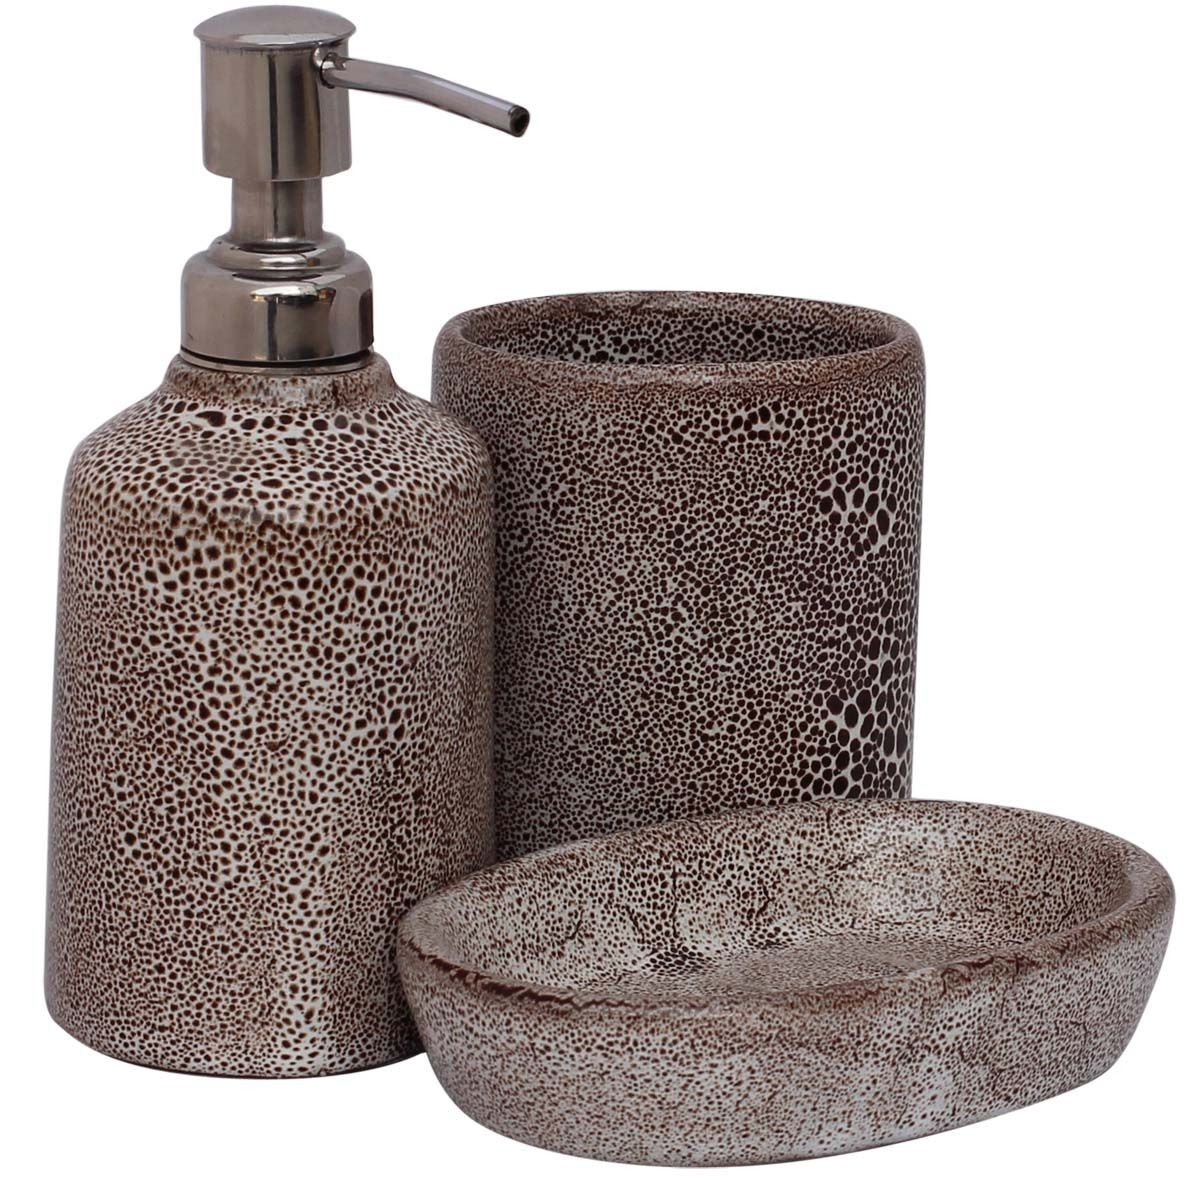 Bulk Wholesale Handmade Ceramic Bath Accessories Set 3 Items